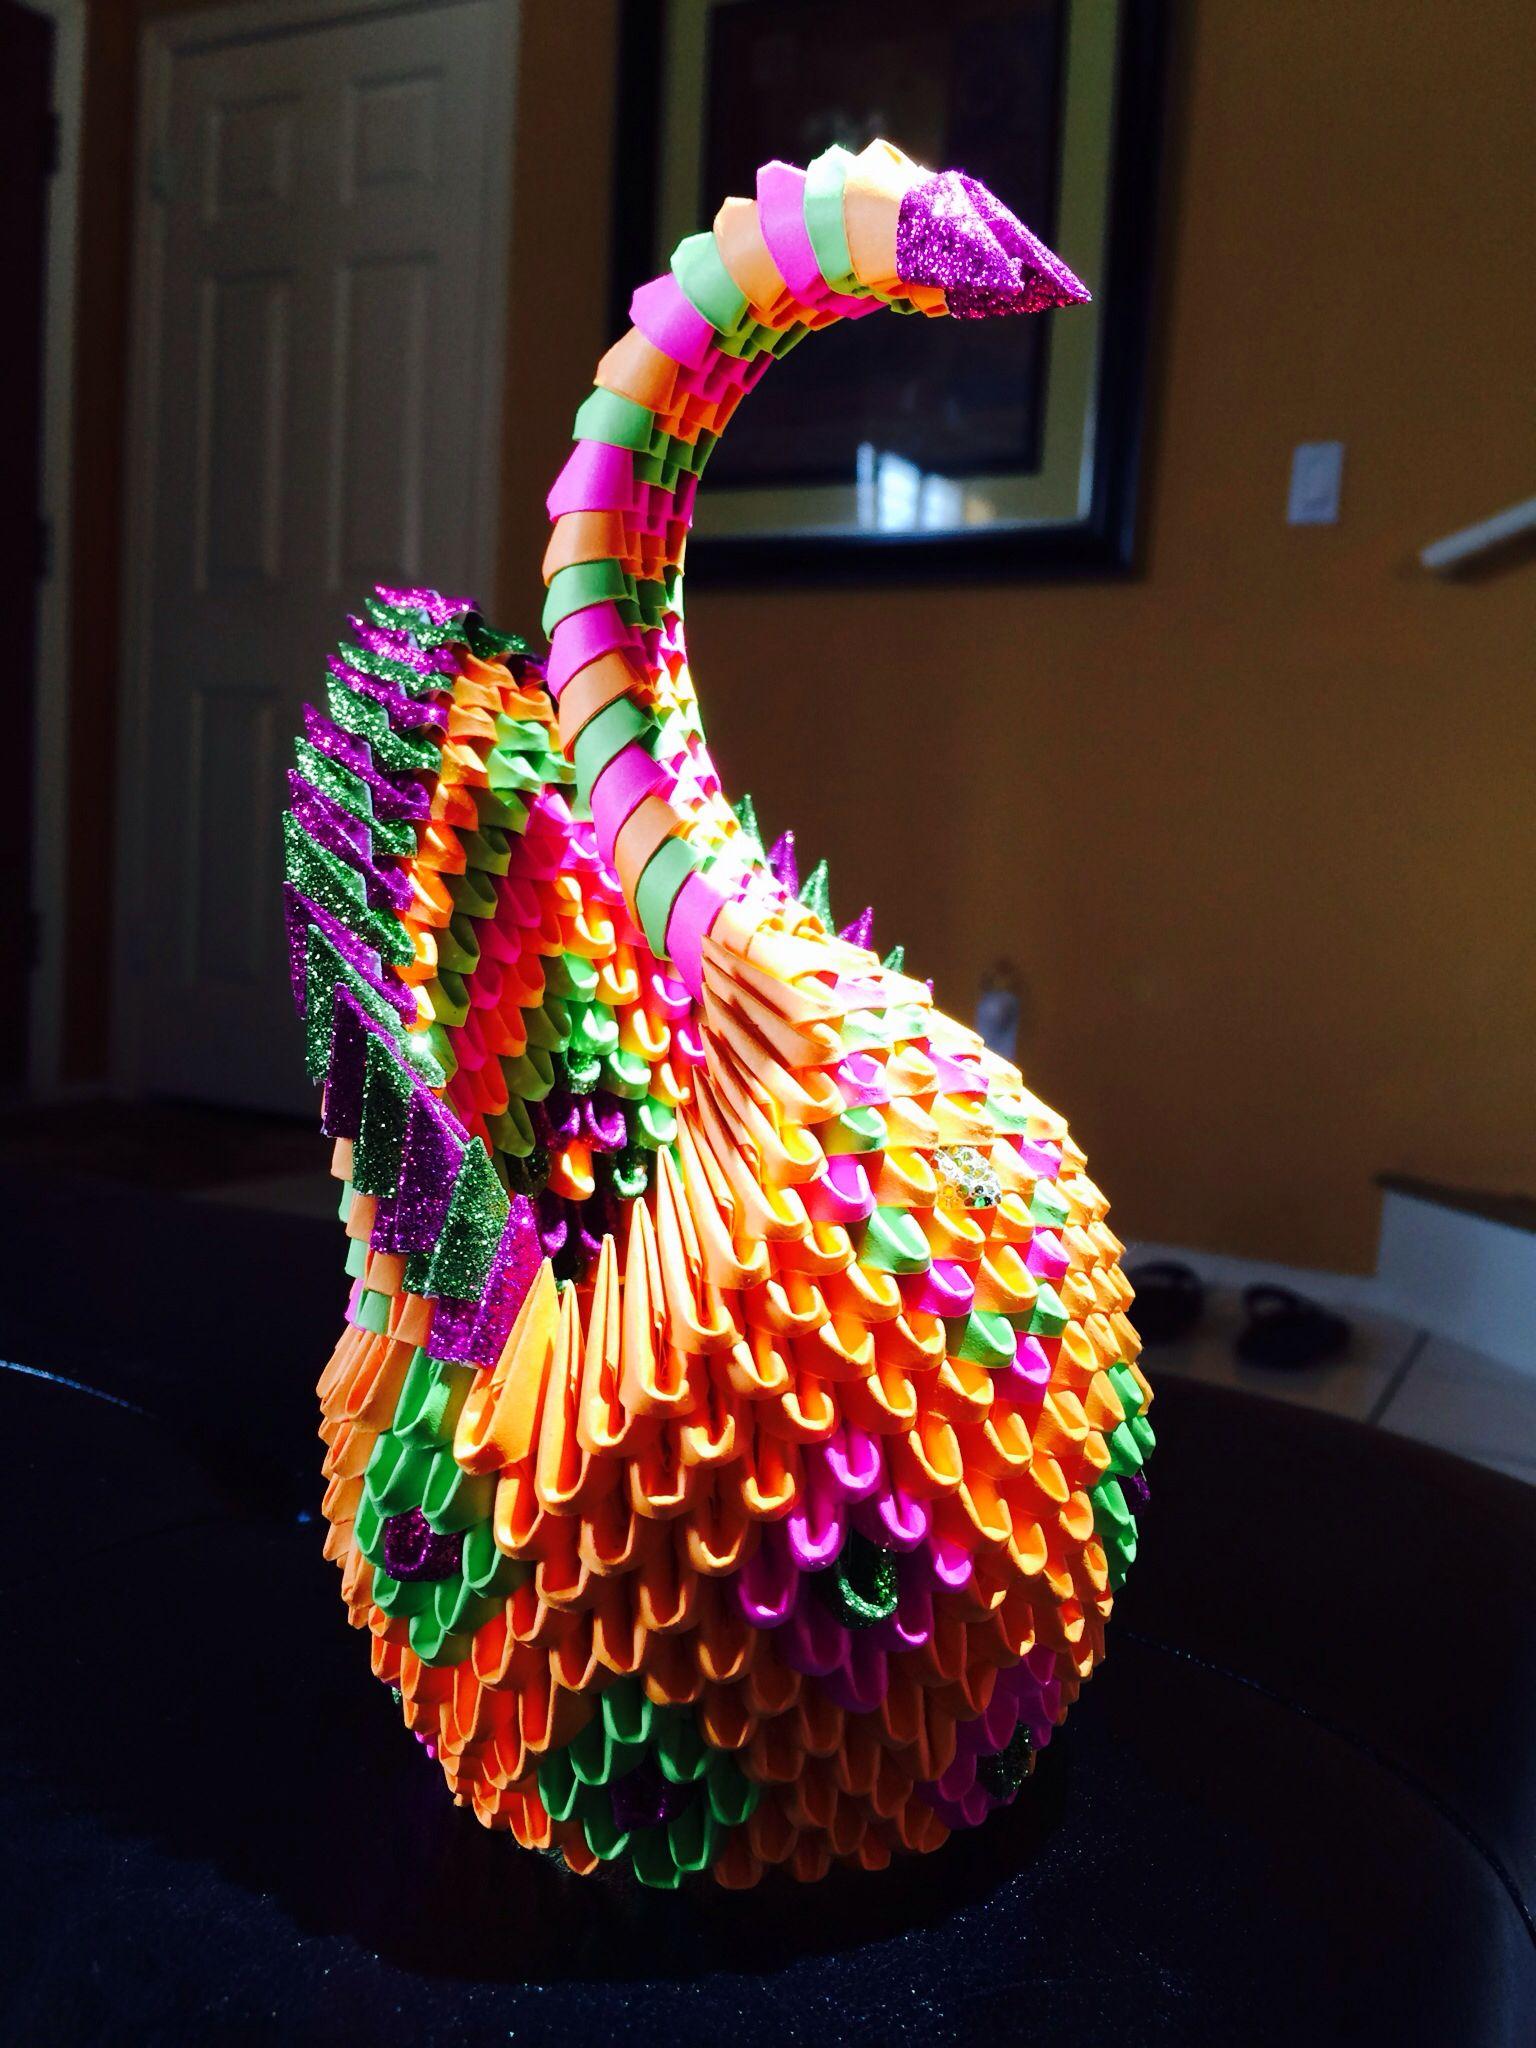 3D origami swan | 3D origami | Pinterest | Origami swan ... - photo#37